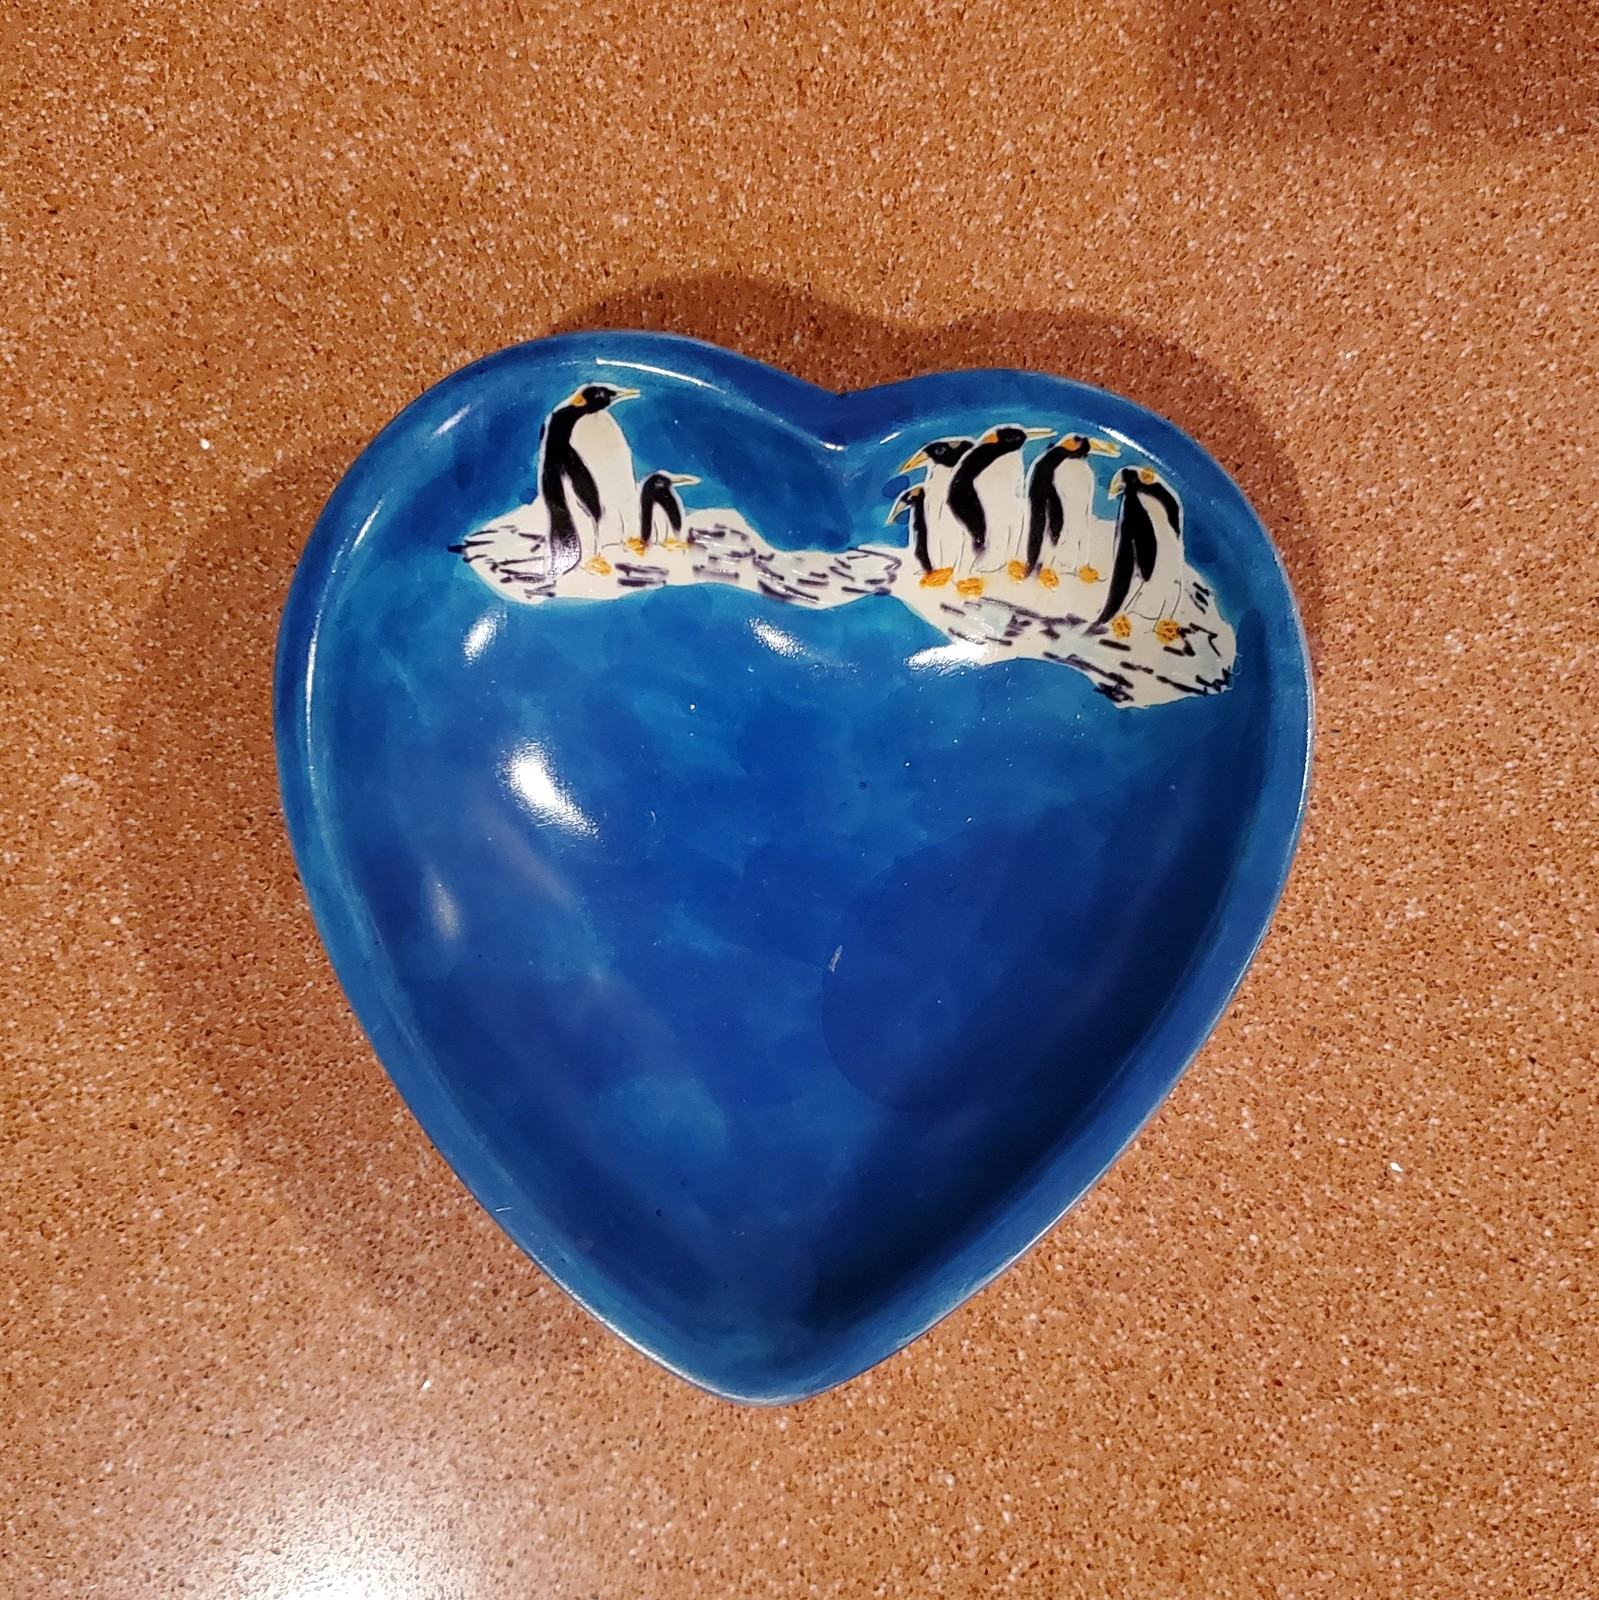 Blueheartdish penguins 1